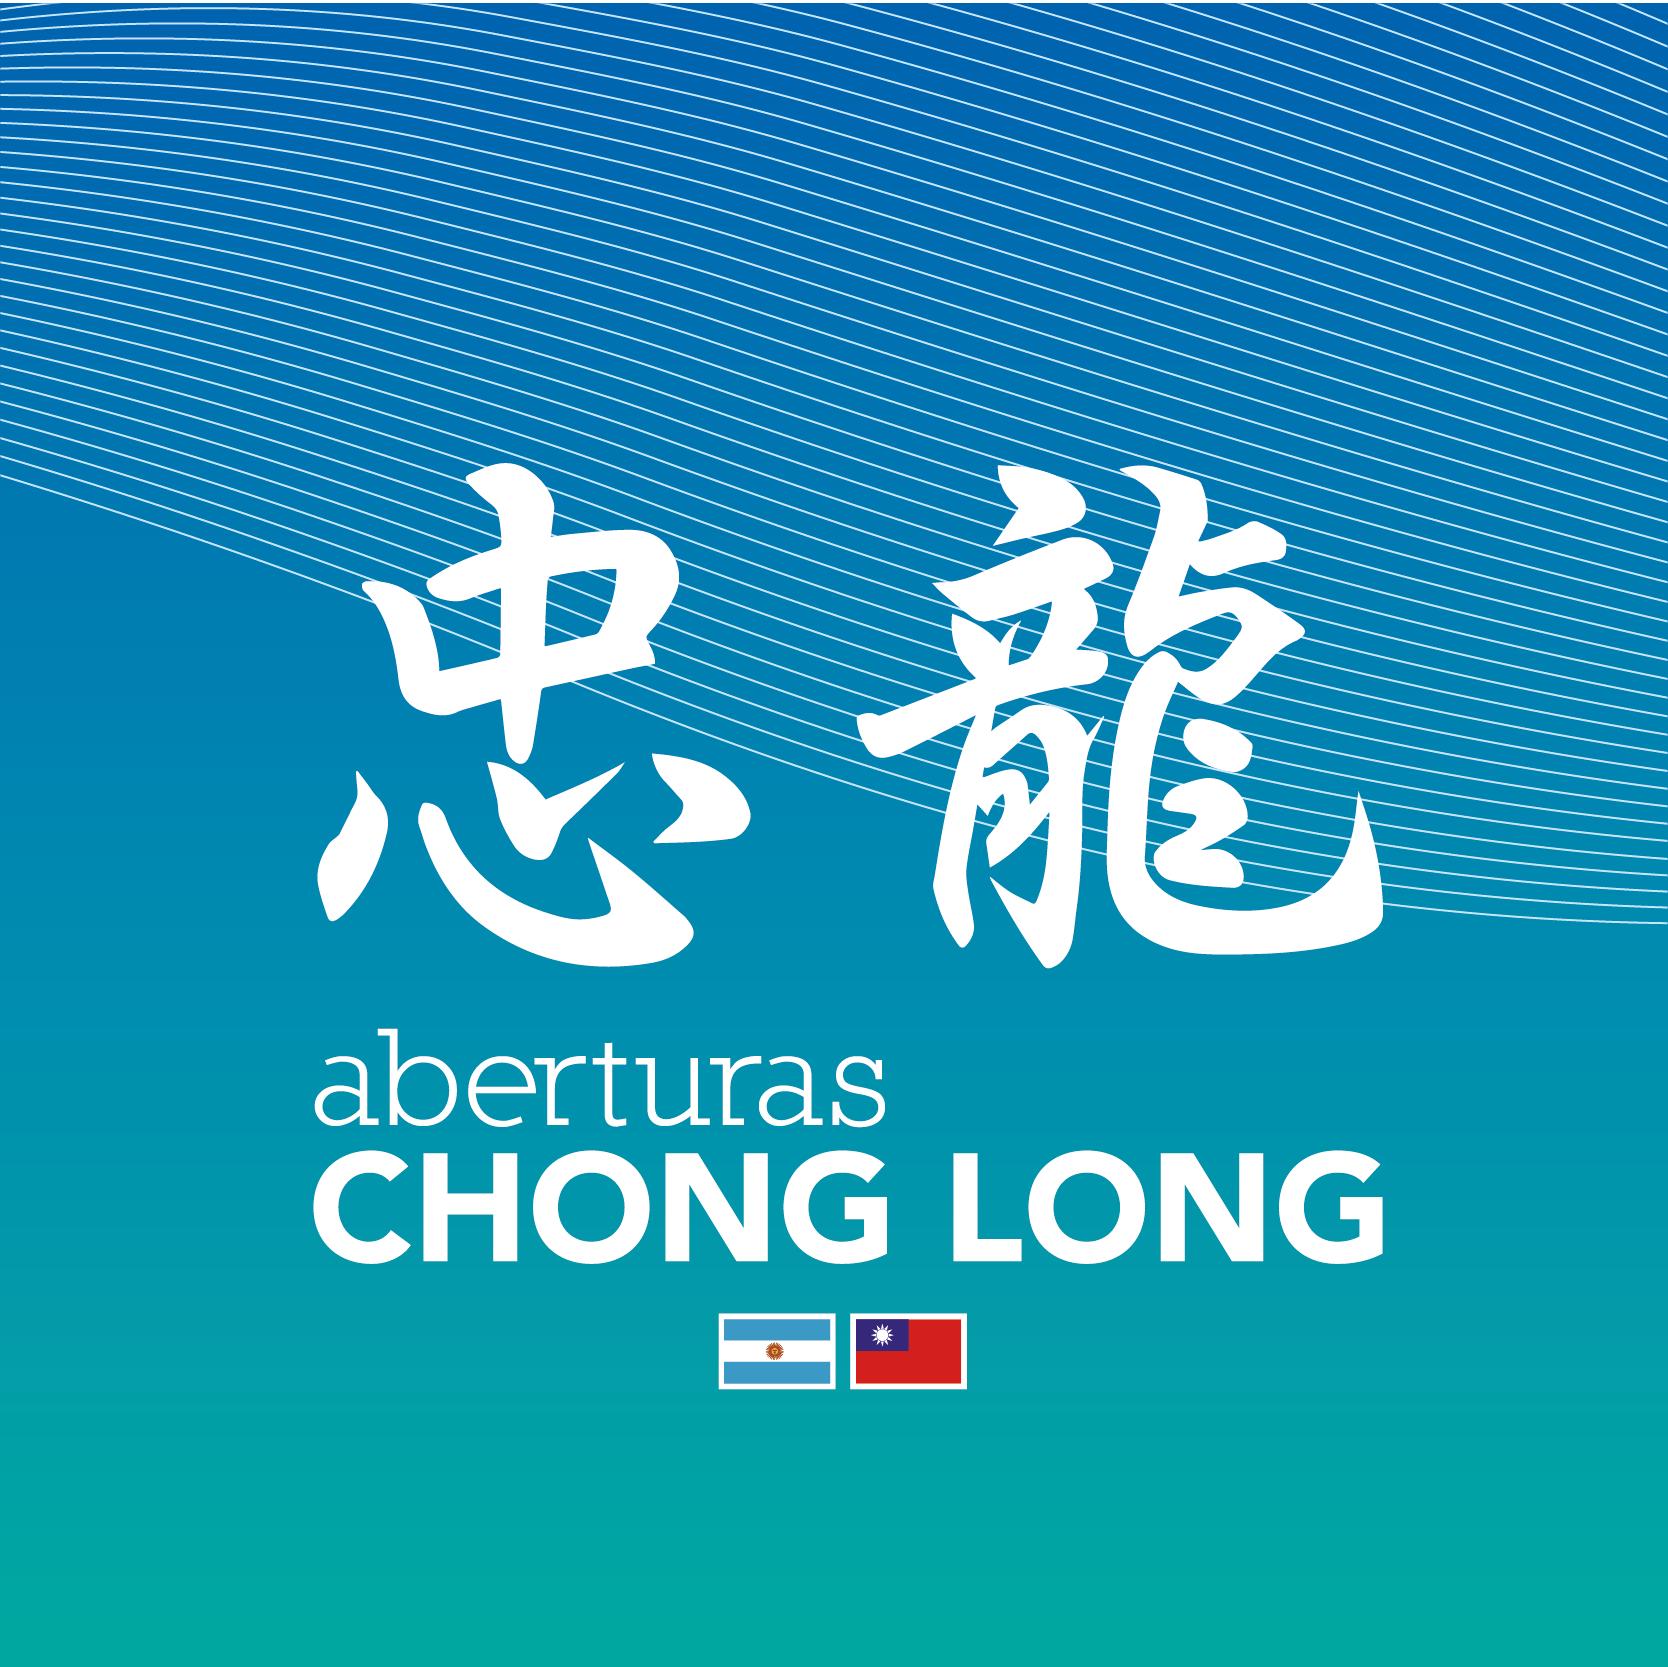 Rediseño Isologotipo Aberturas Chong Long